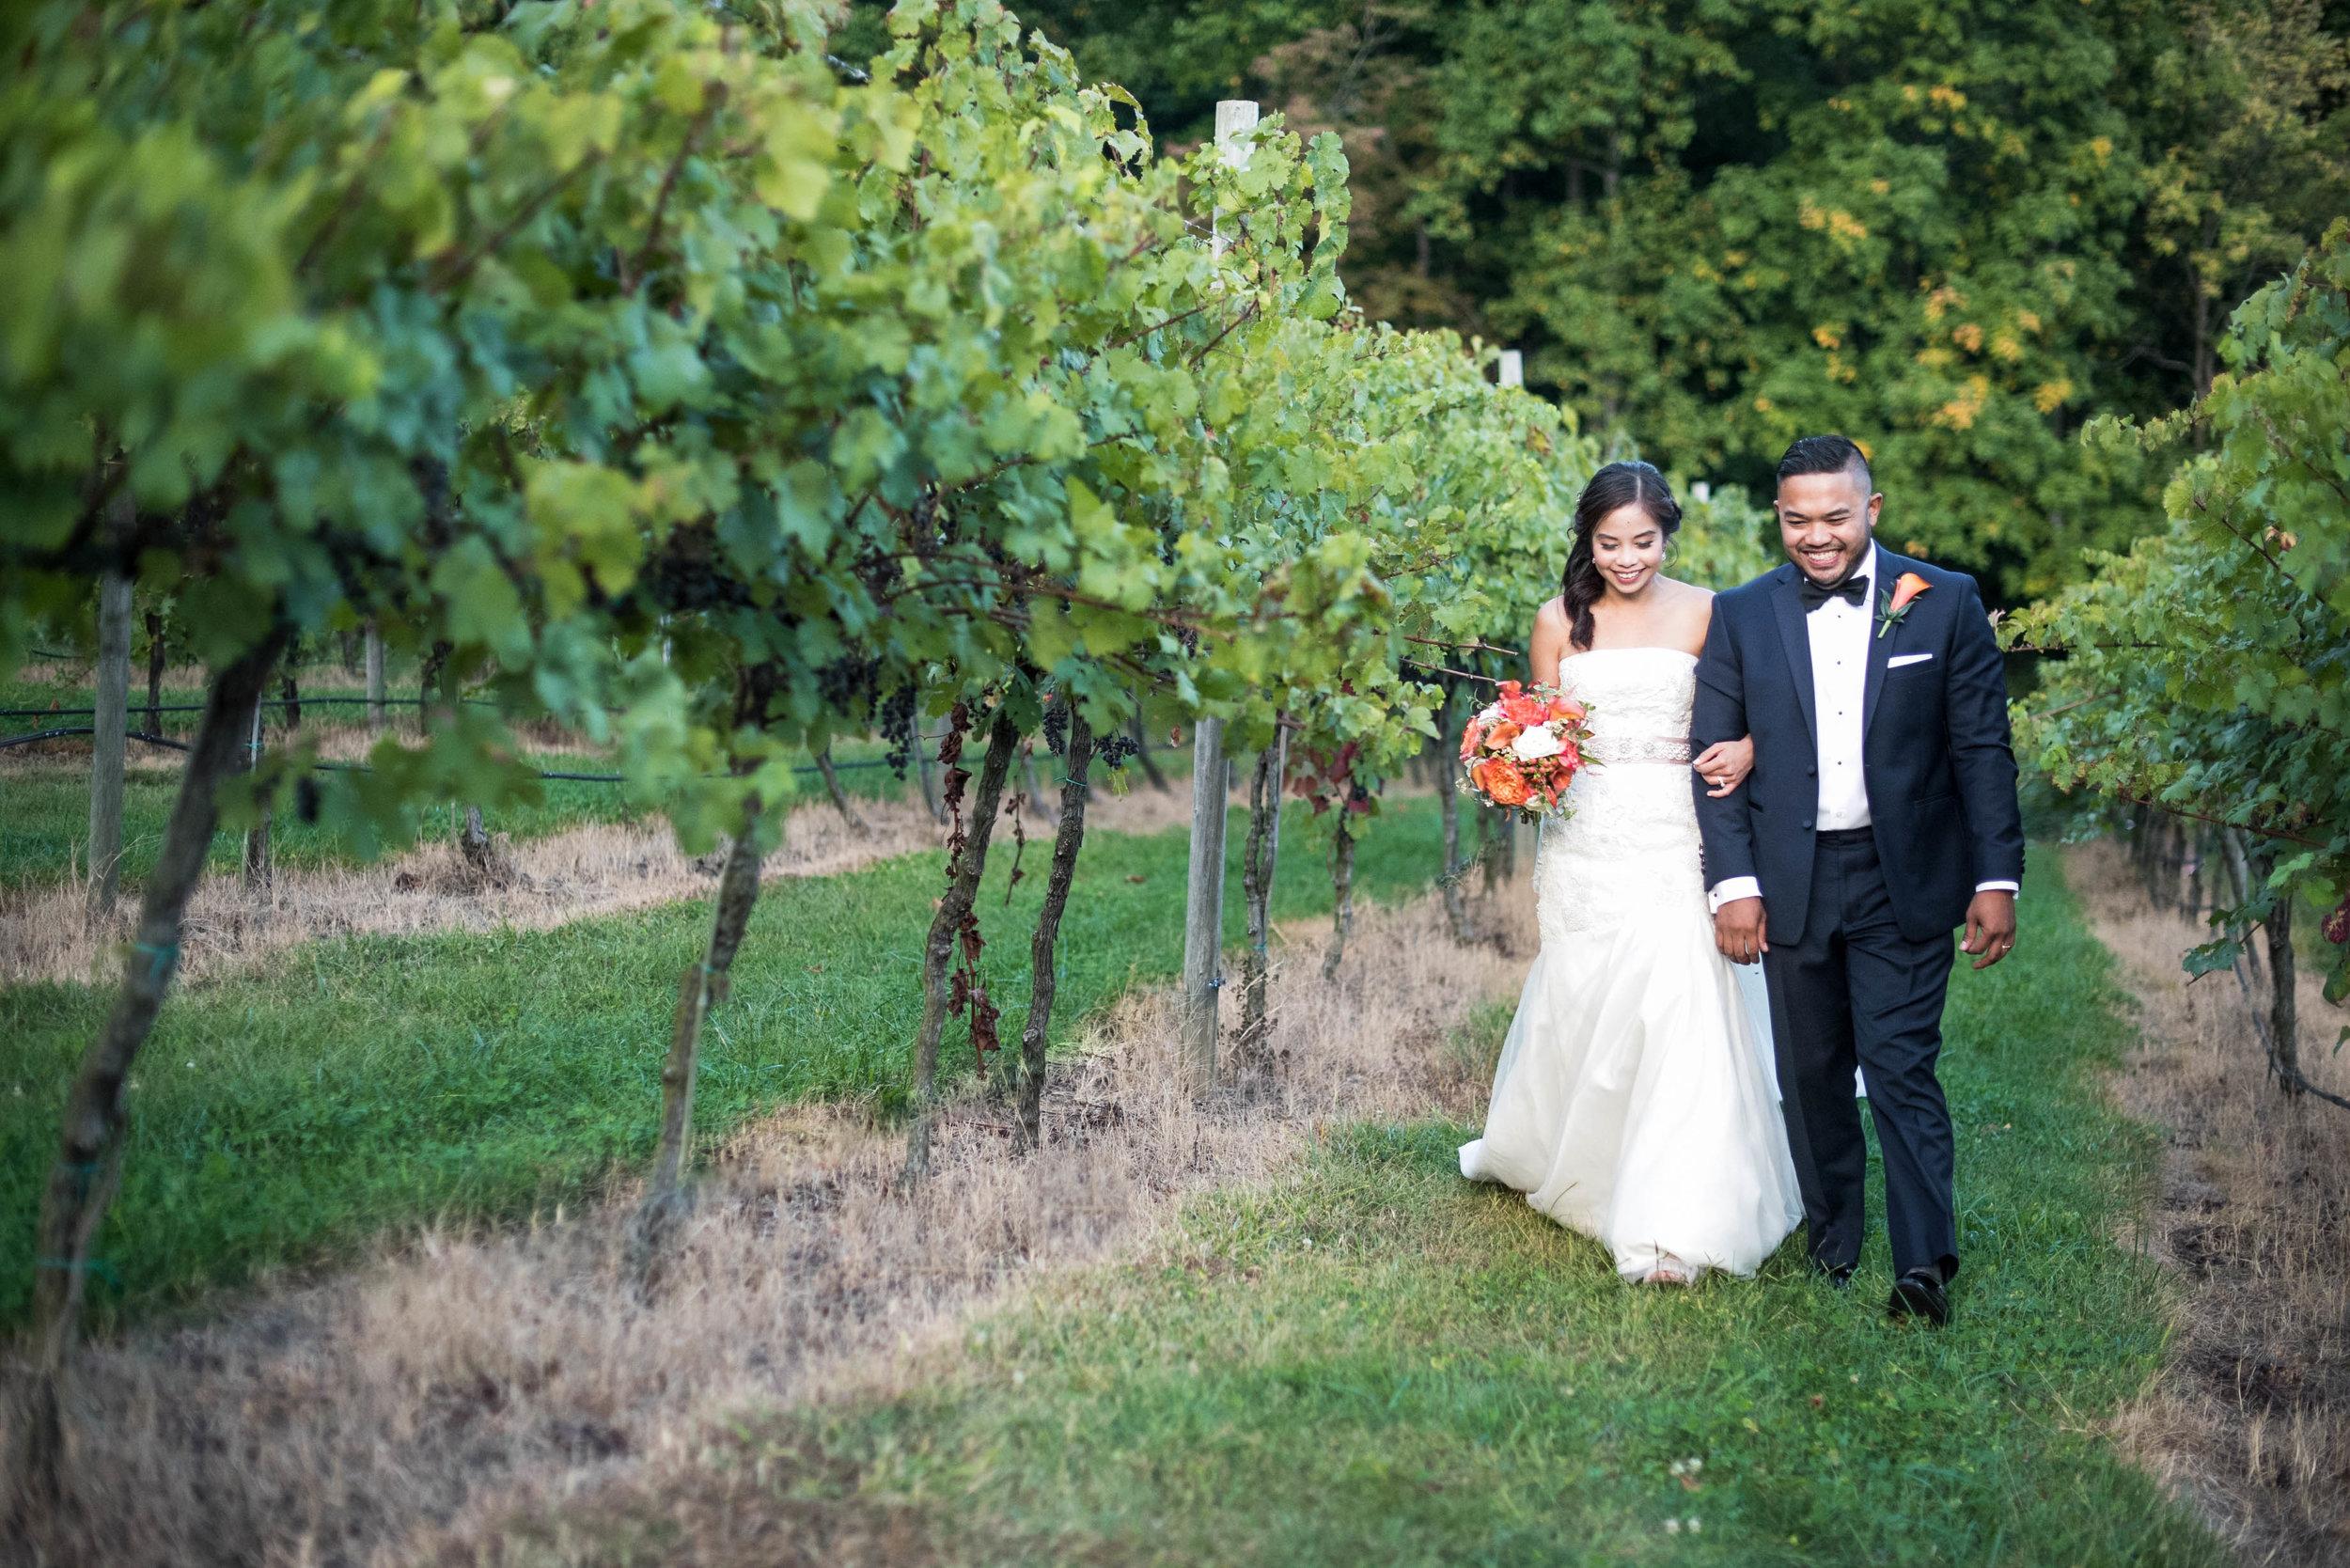 Will Hawkins Photography, Virginia Wedding Photographer, Virginia Beach Wedding Photographer, Destination Wedding Photographer (165 of 339).jpg